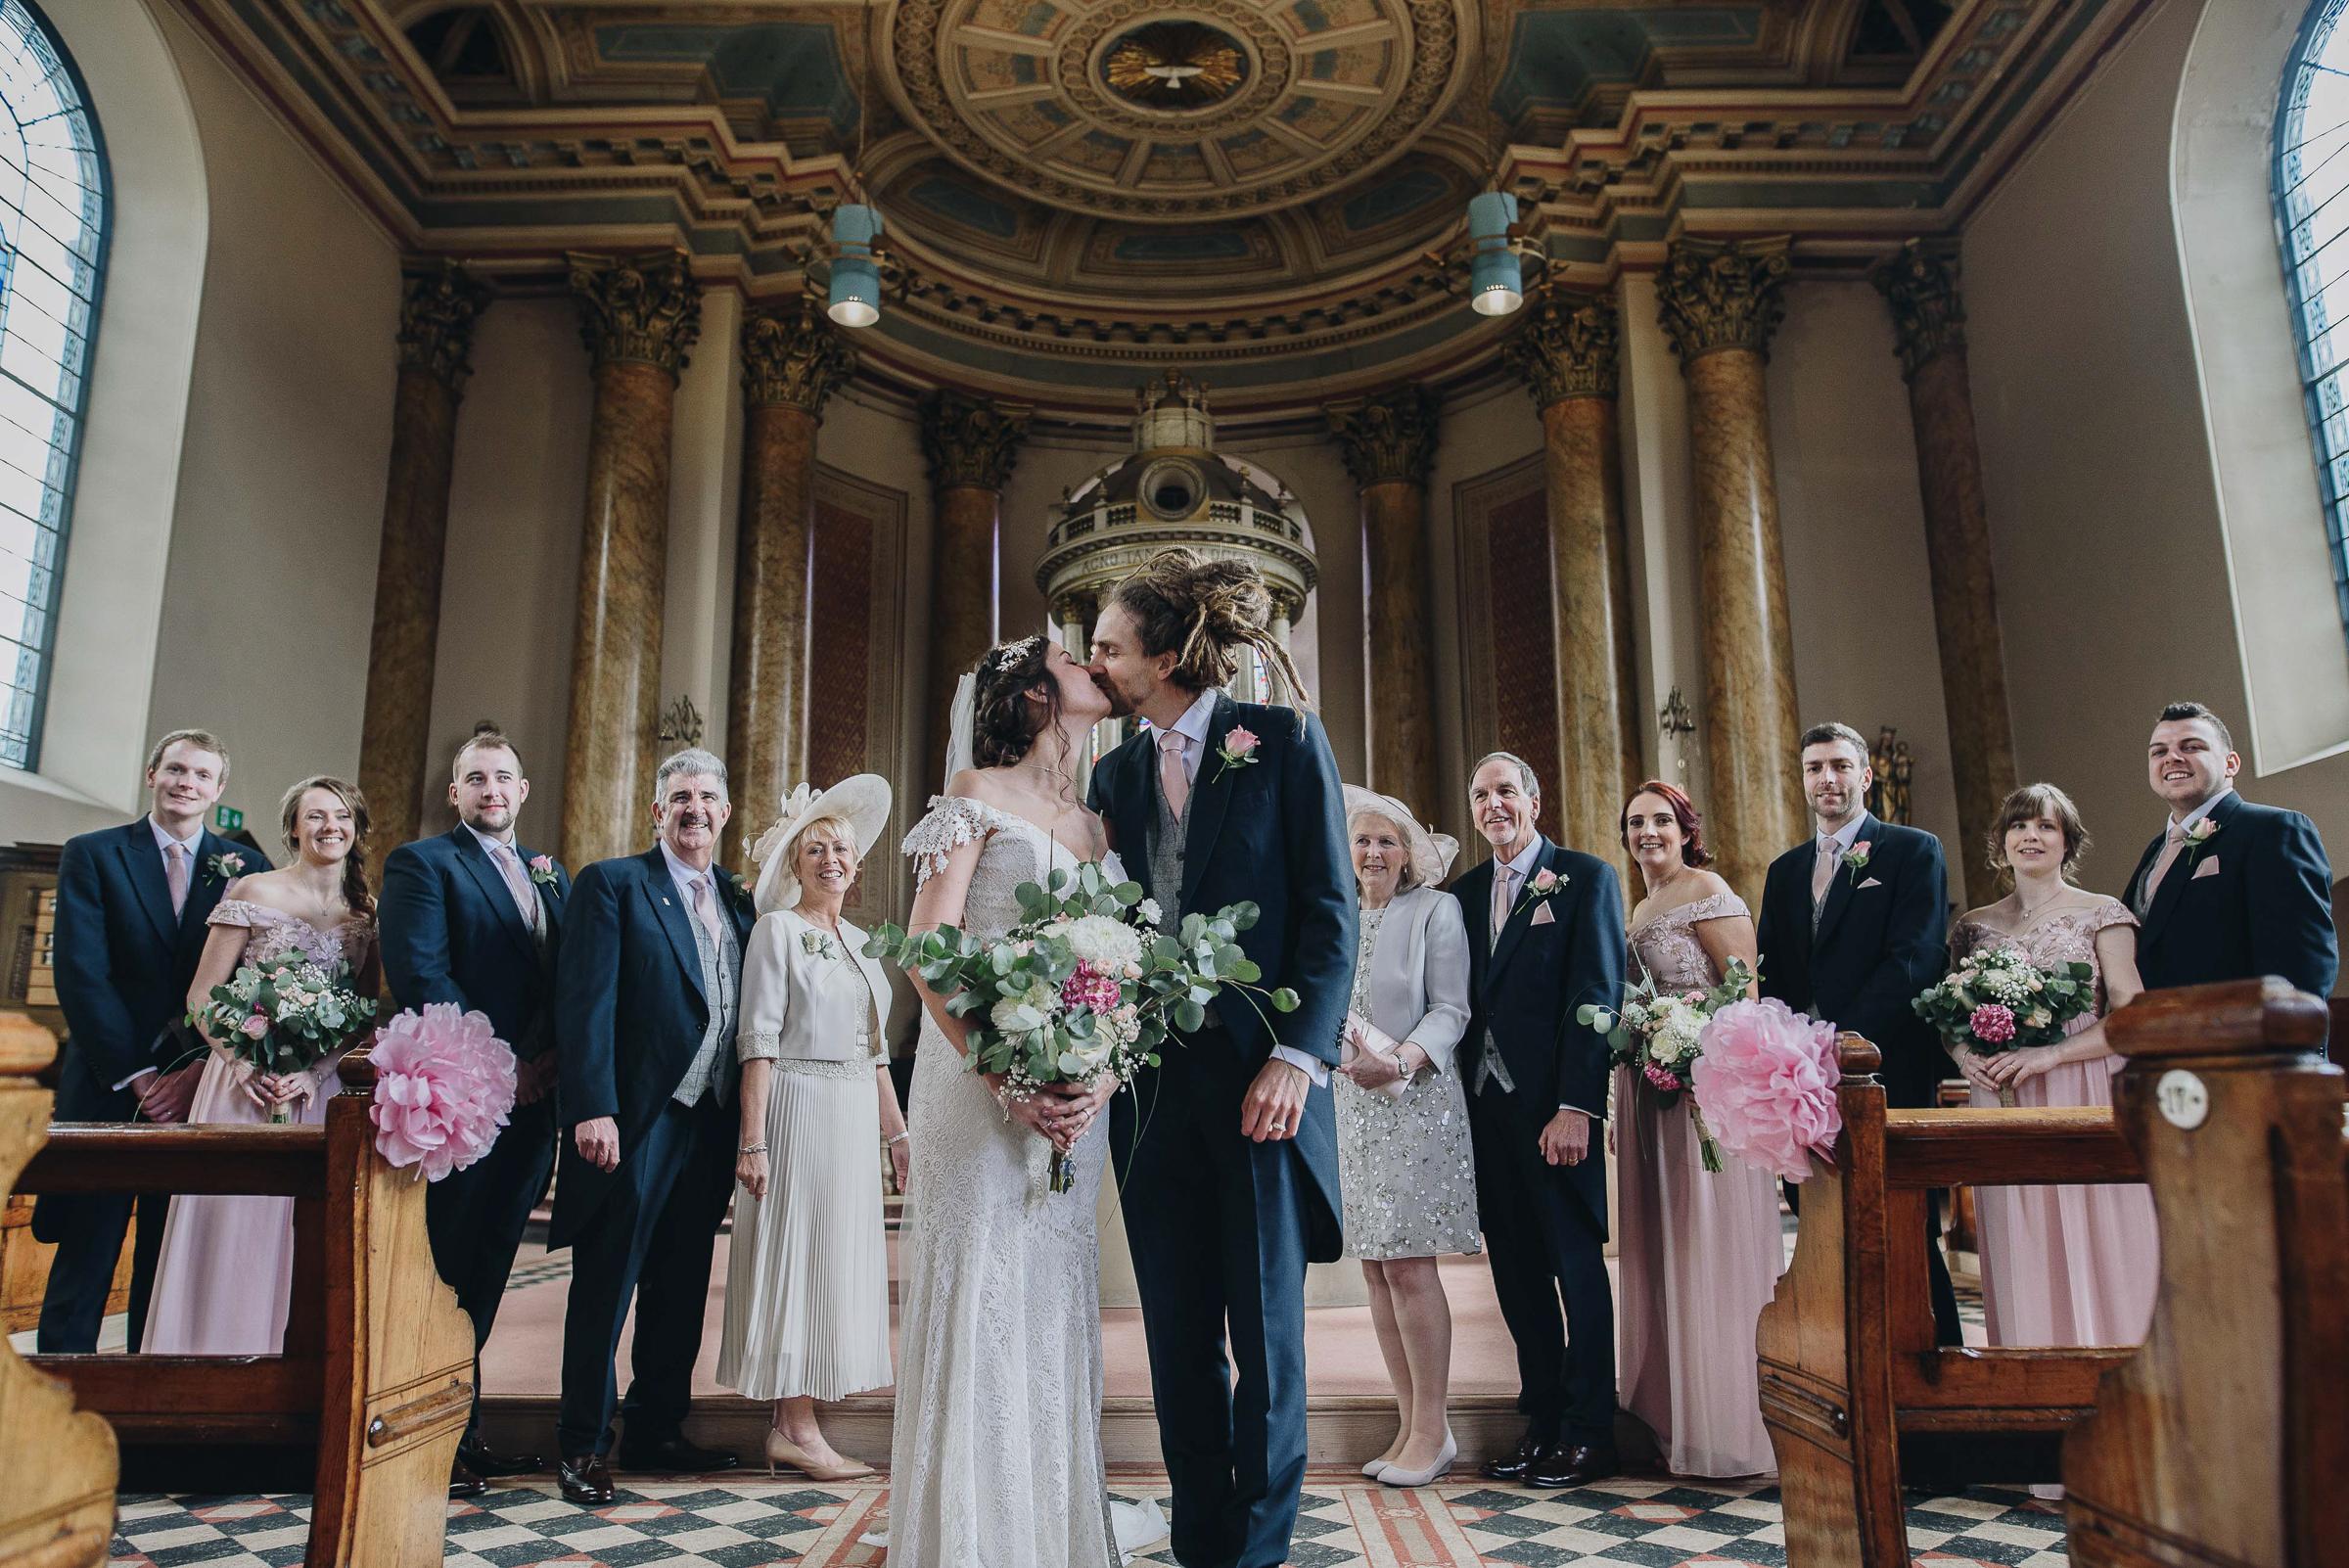 Rochdale-town-hall-vegan-harry-potter-wedding-photography-26.jpg